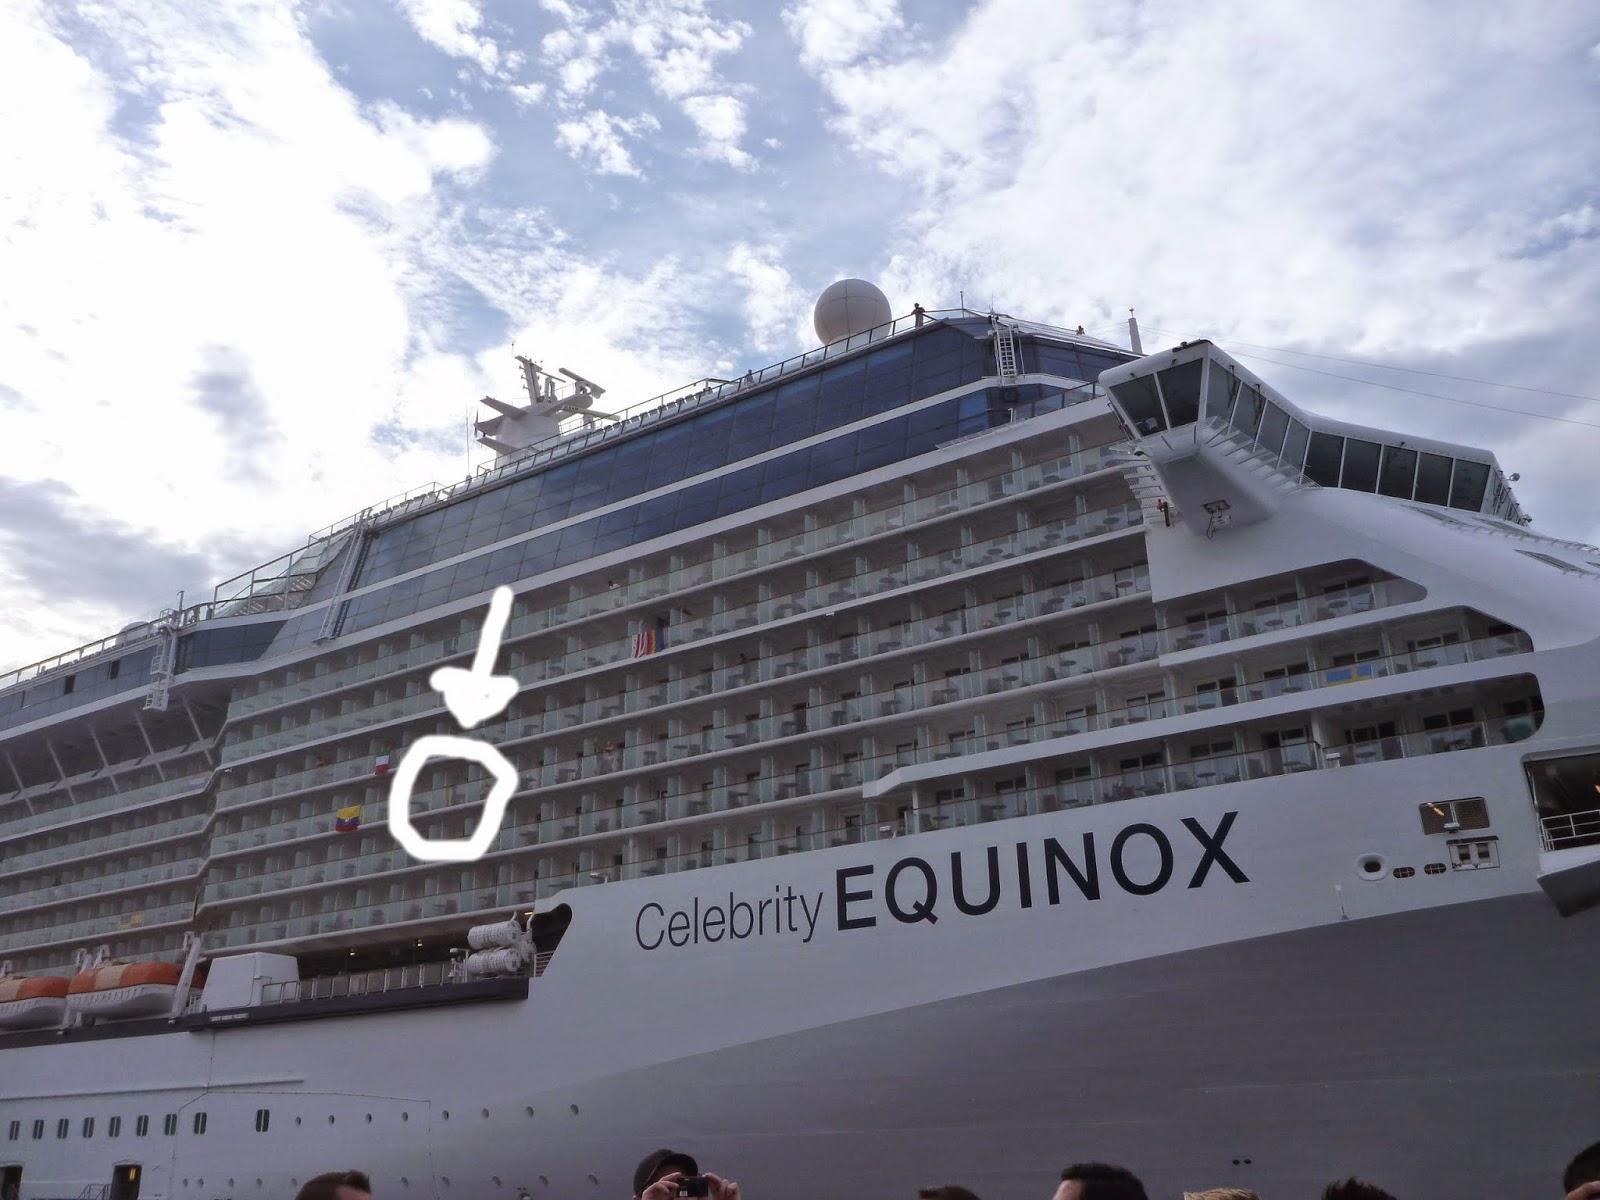 Celebrity Equinox| Modern Luxury Celebrity Cruise Vacation